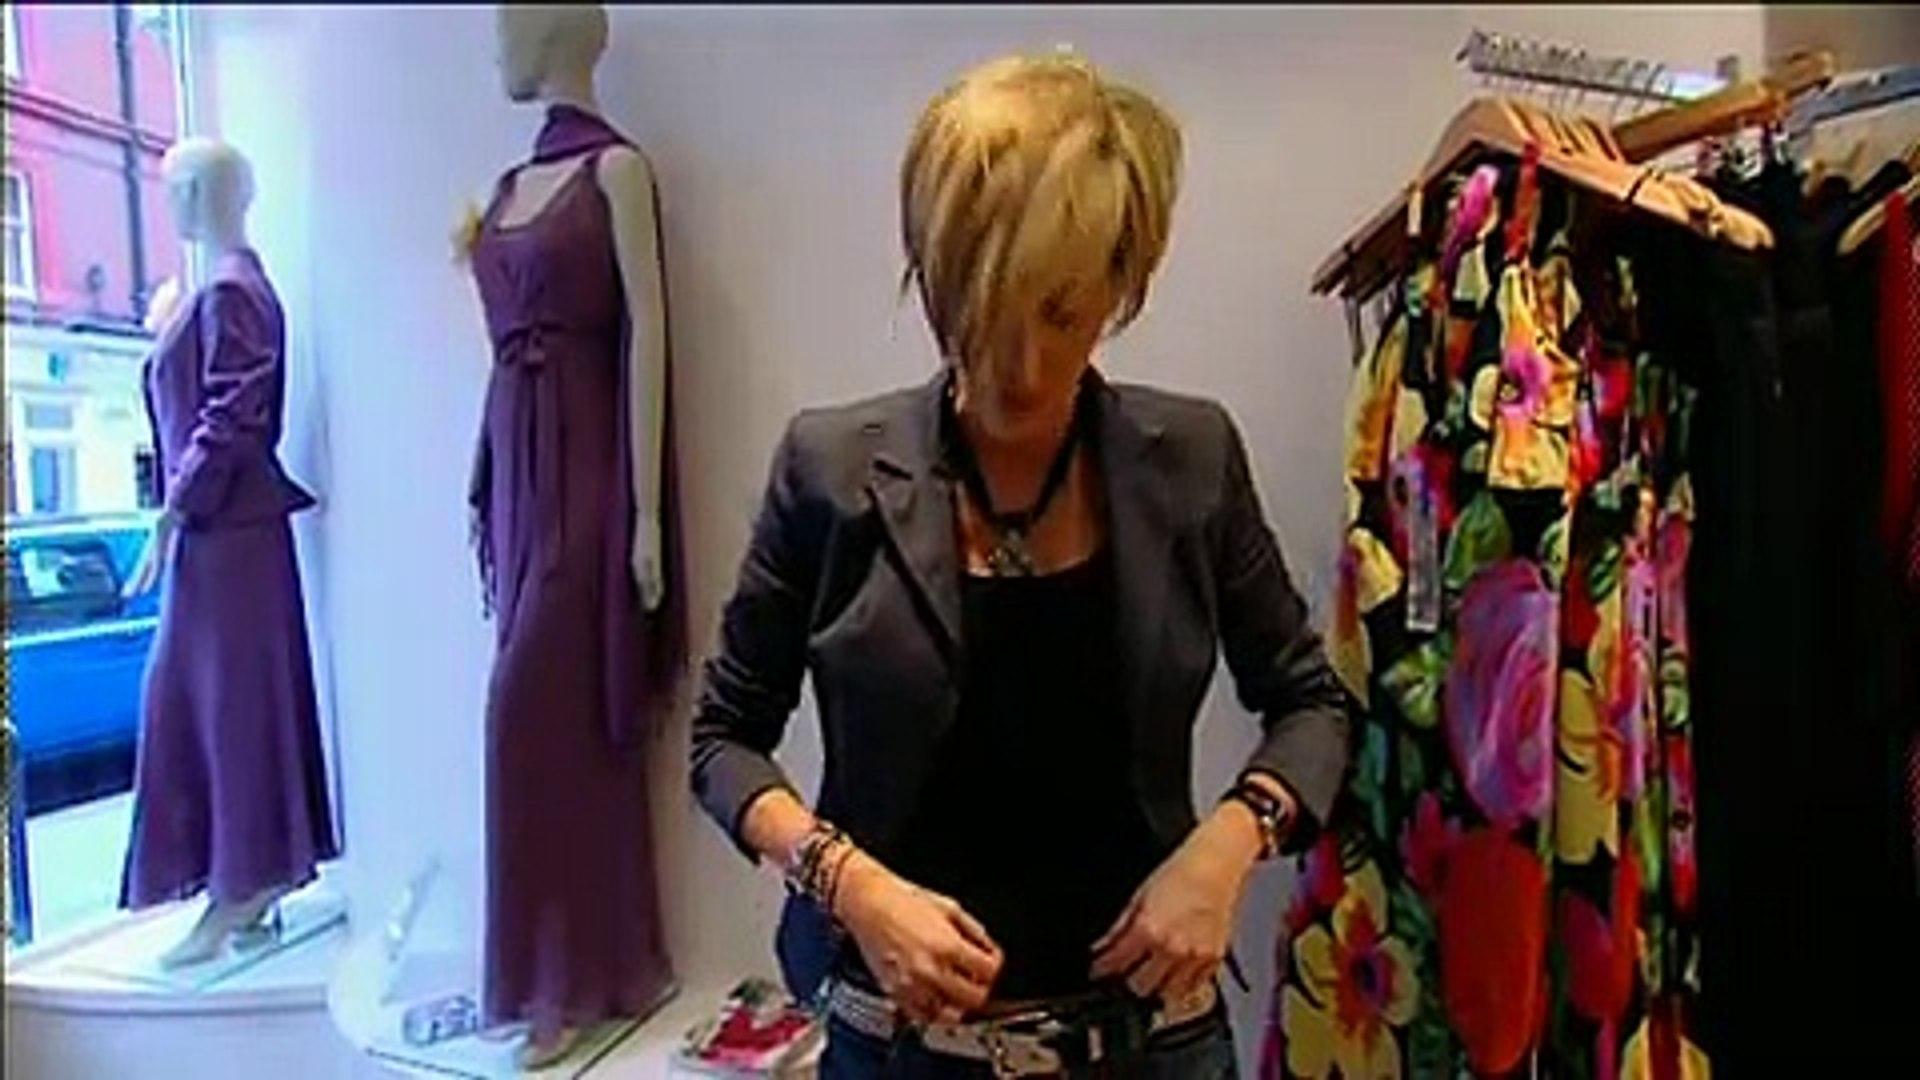 Long Tall Sally Video- Tall Women's Clothing